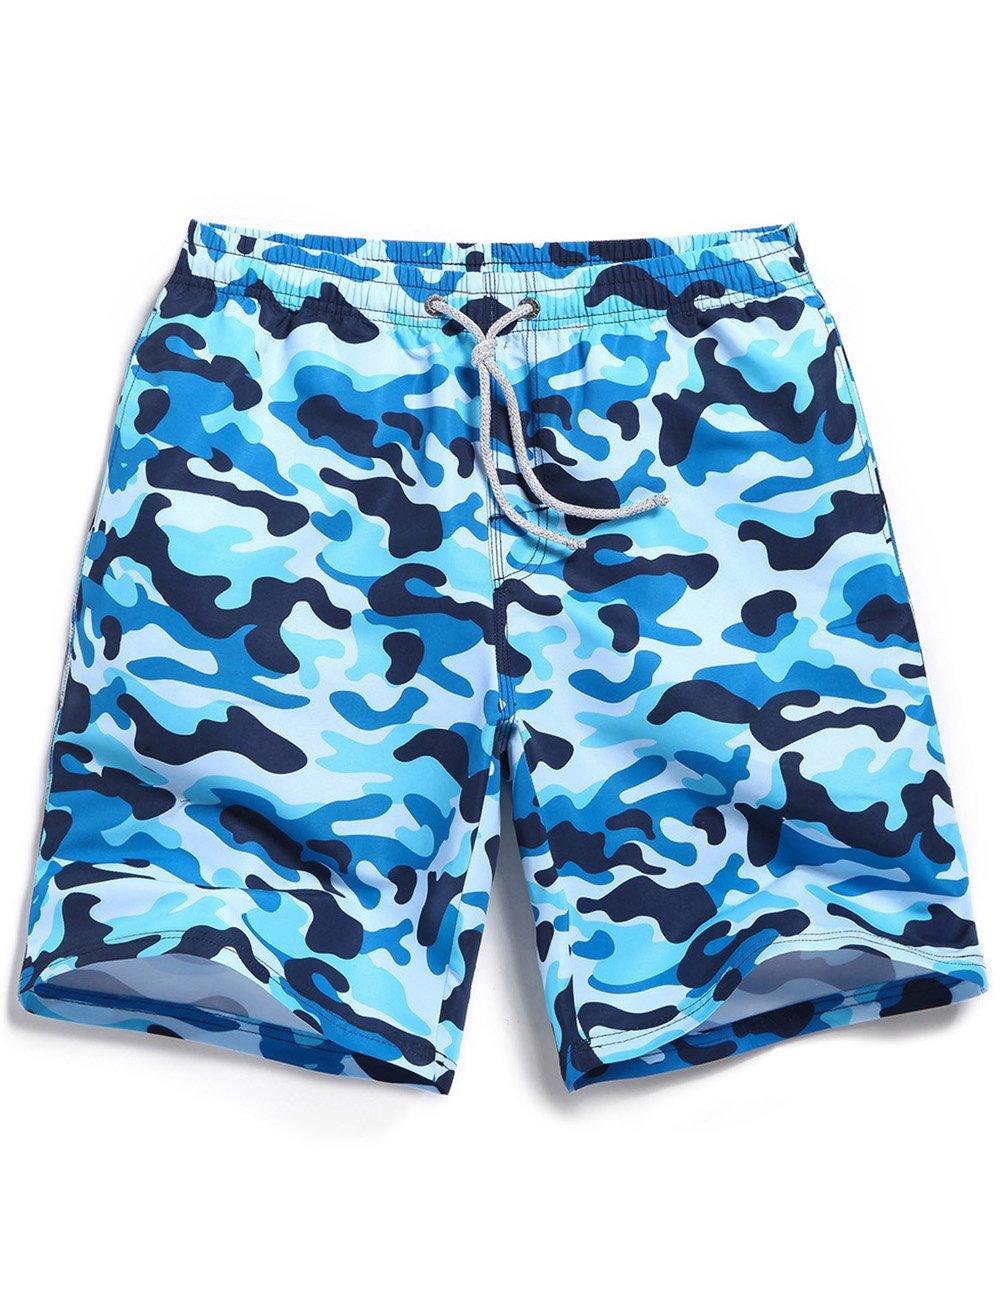 SHENGRUI Men's Swim Trunks Quick Dry Bathing Suits Printed Swim Shorts